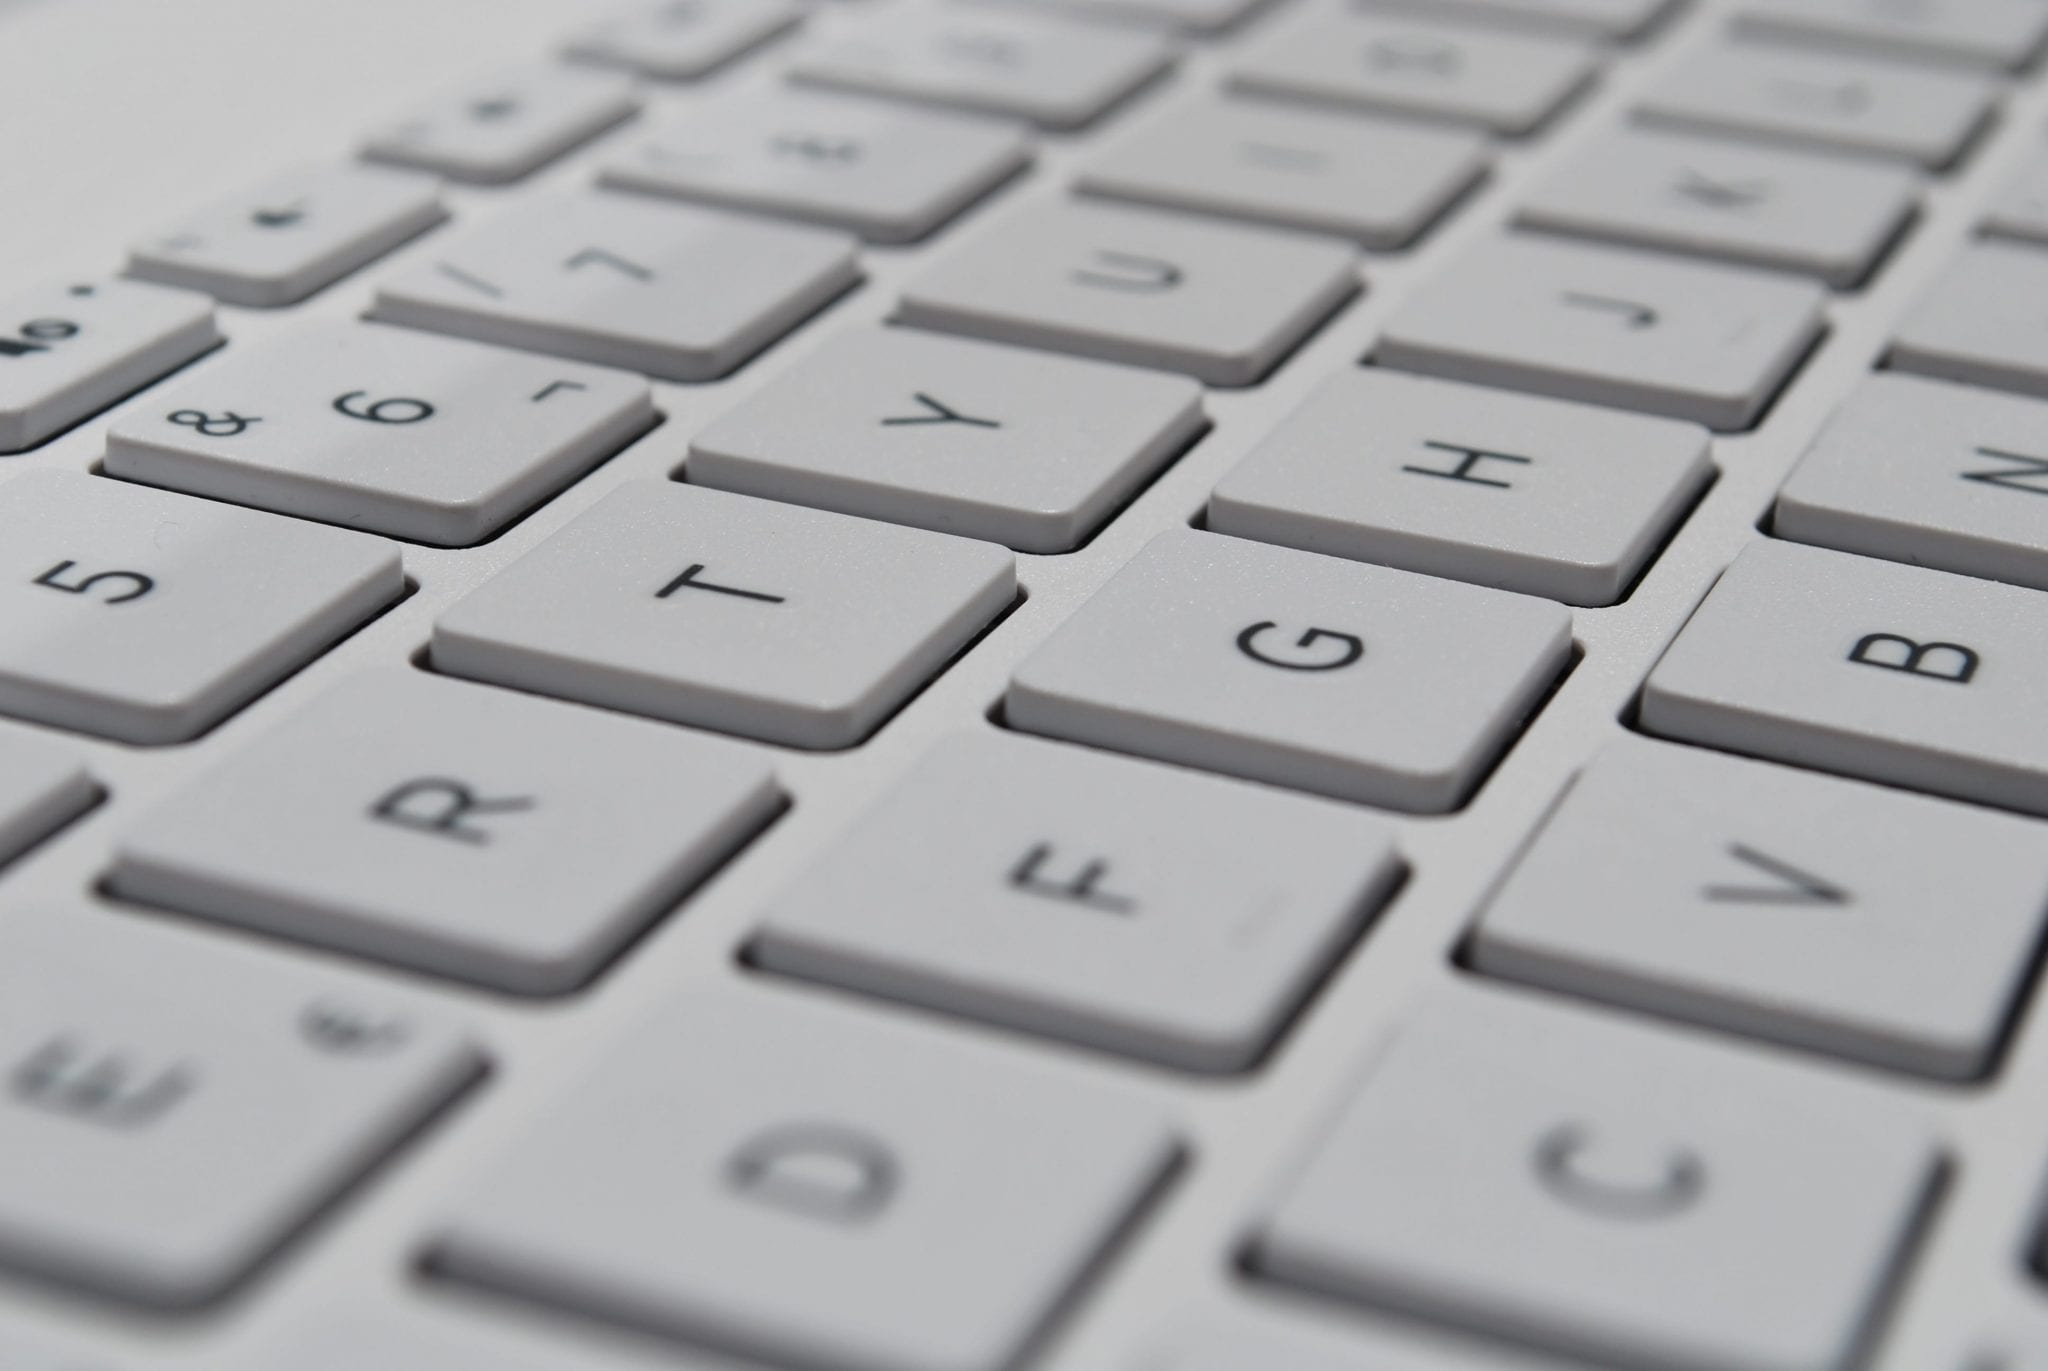 Computer keyboard; image by Sergi Kabrera, via Unsplash.com.